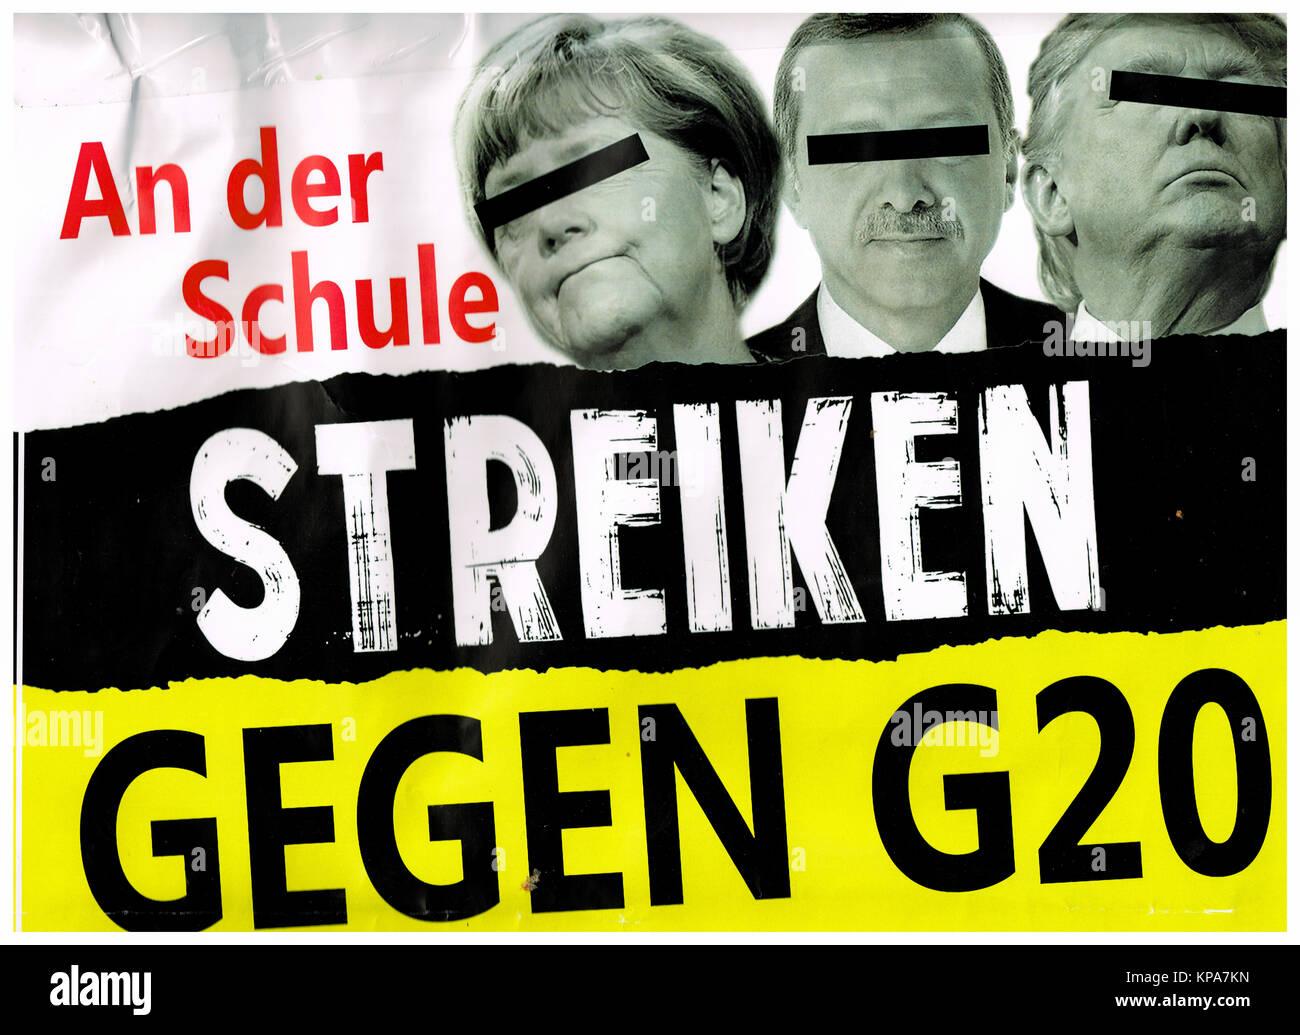 Anti-G20 poster, Hamburg, Germany - Stock Image